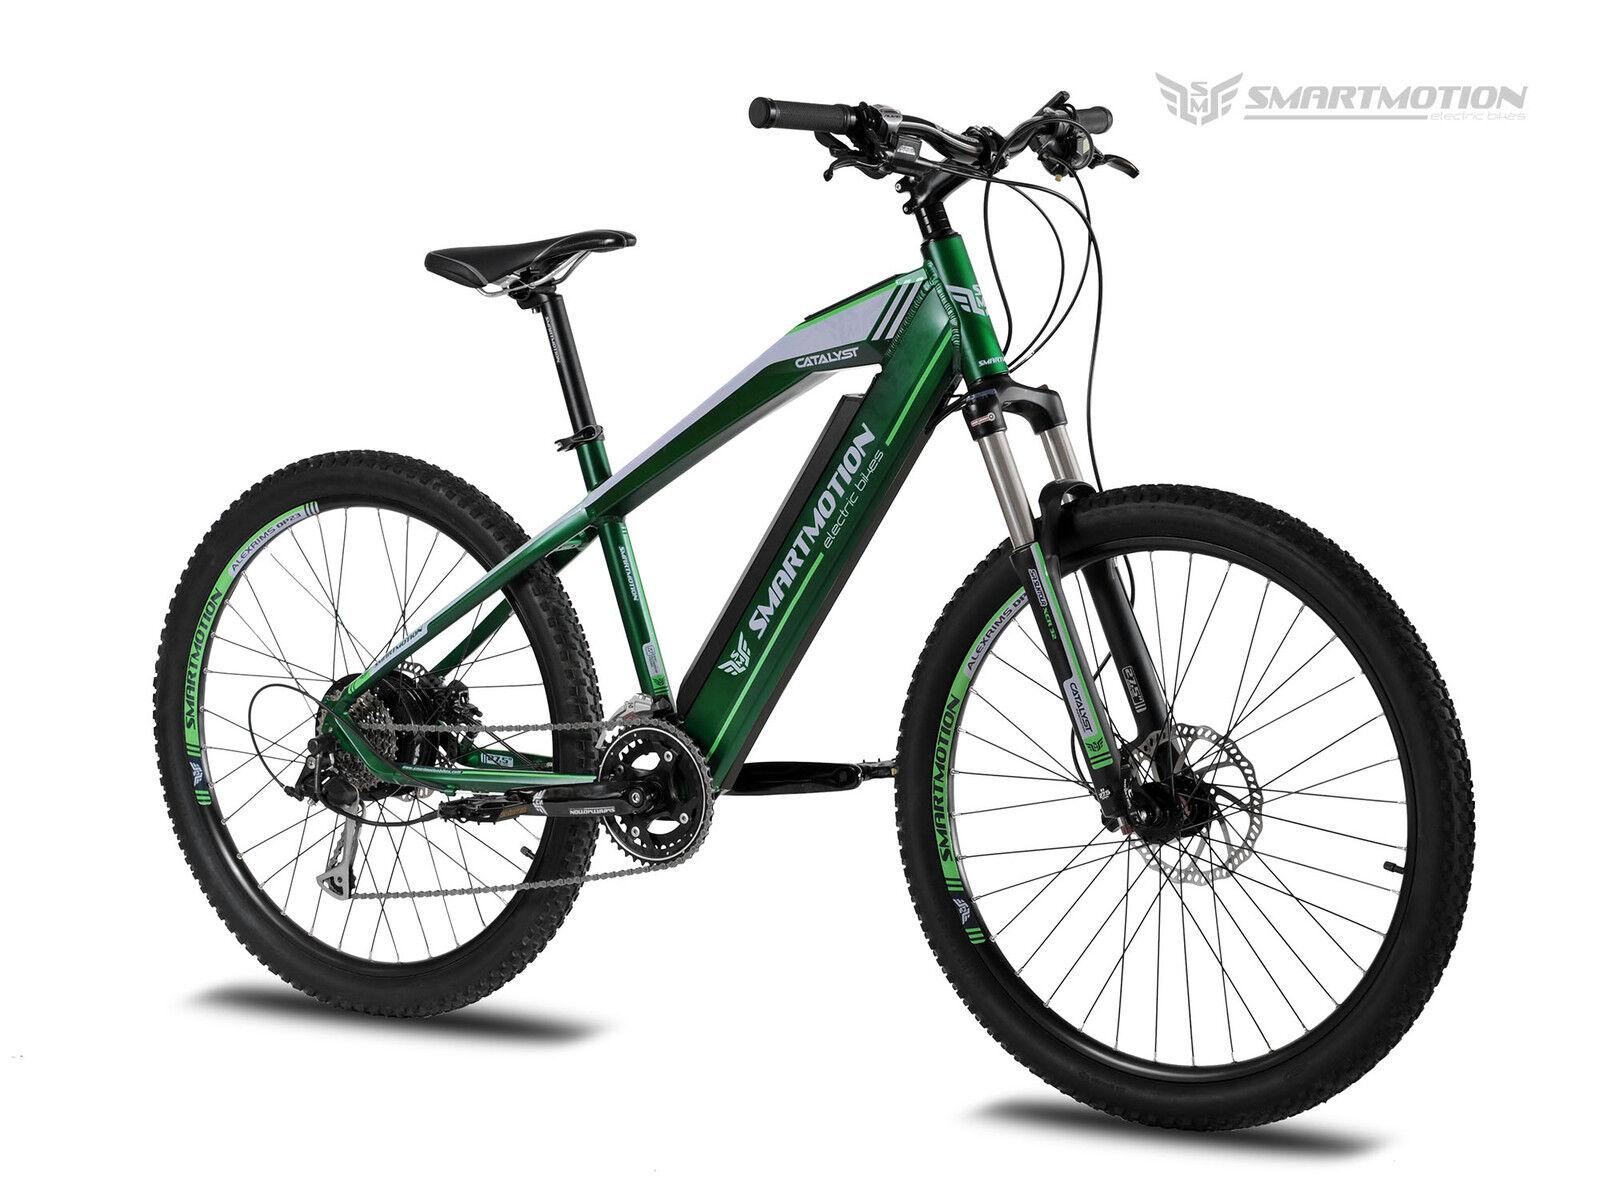 Smartmotion Bikes